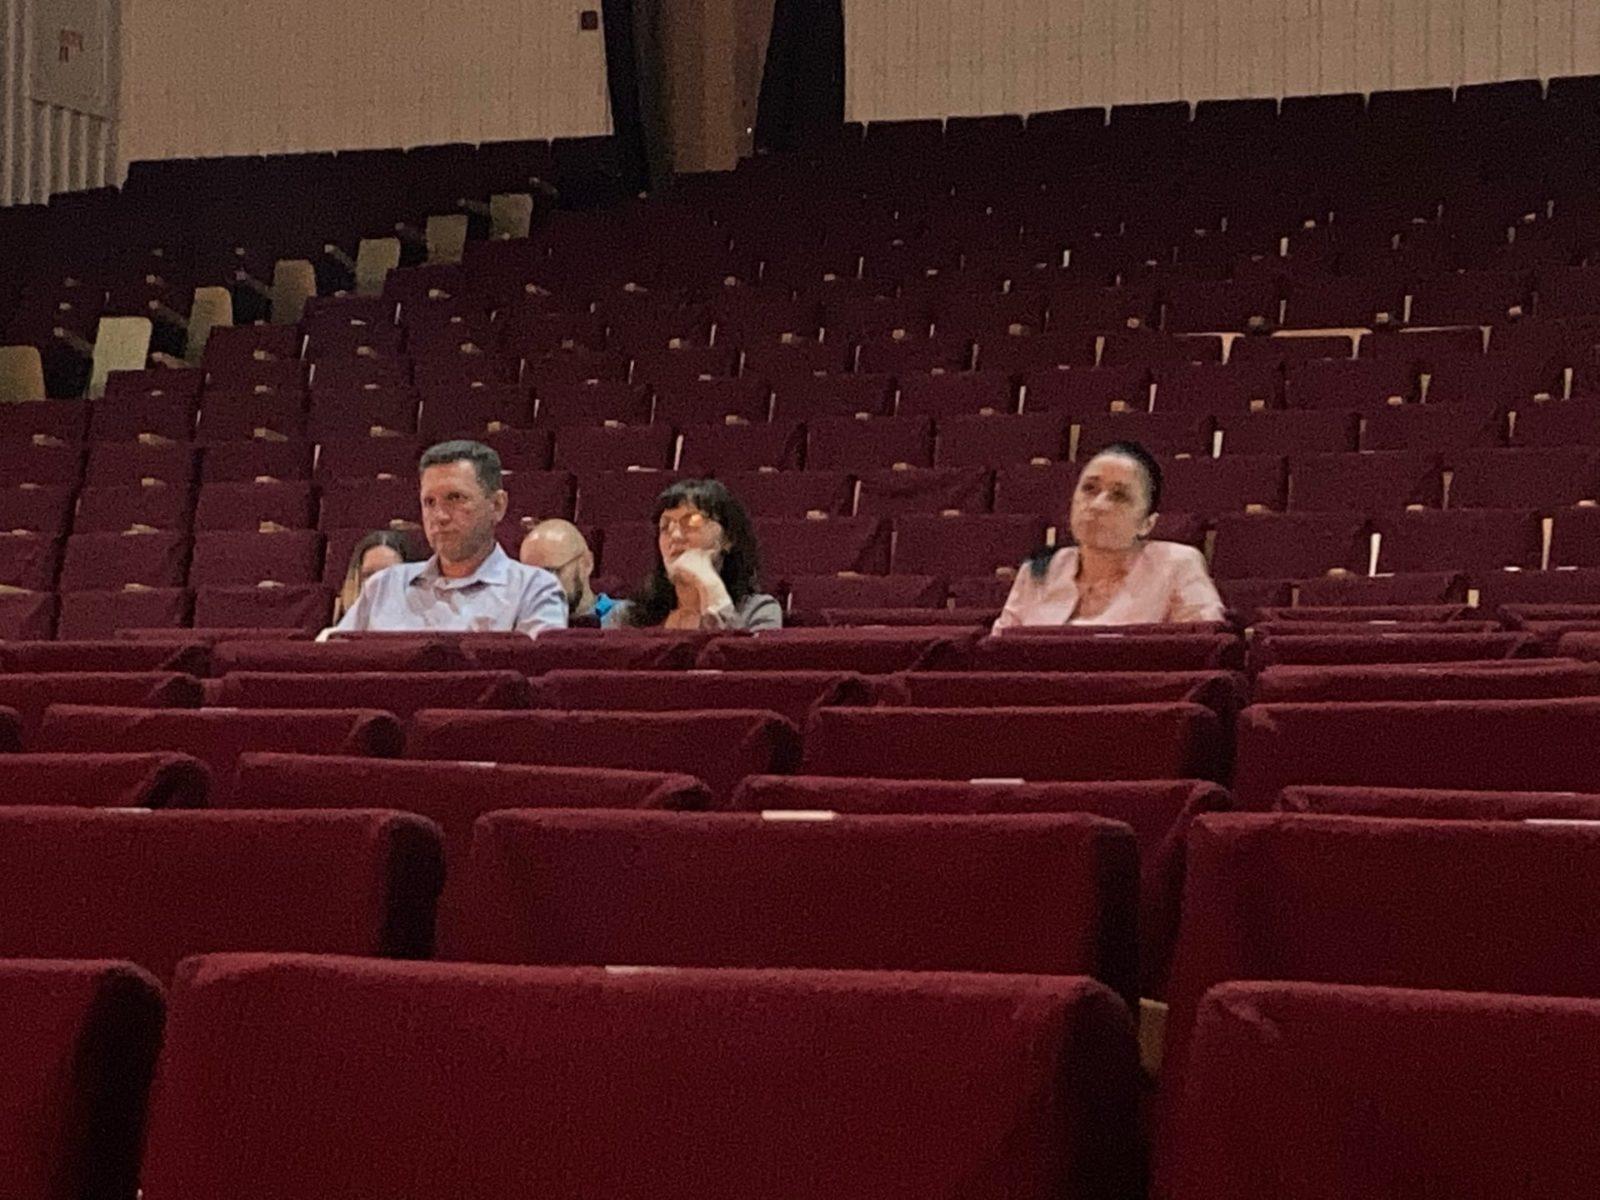 Представители Барановичского горисполкома также присутствовали на встрече с избирателями. Фото: Ирина КОМИК